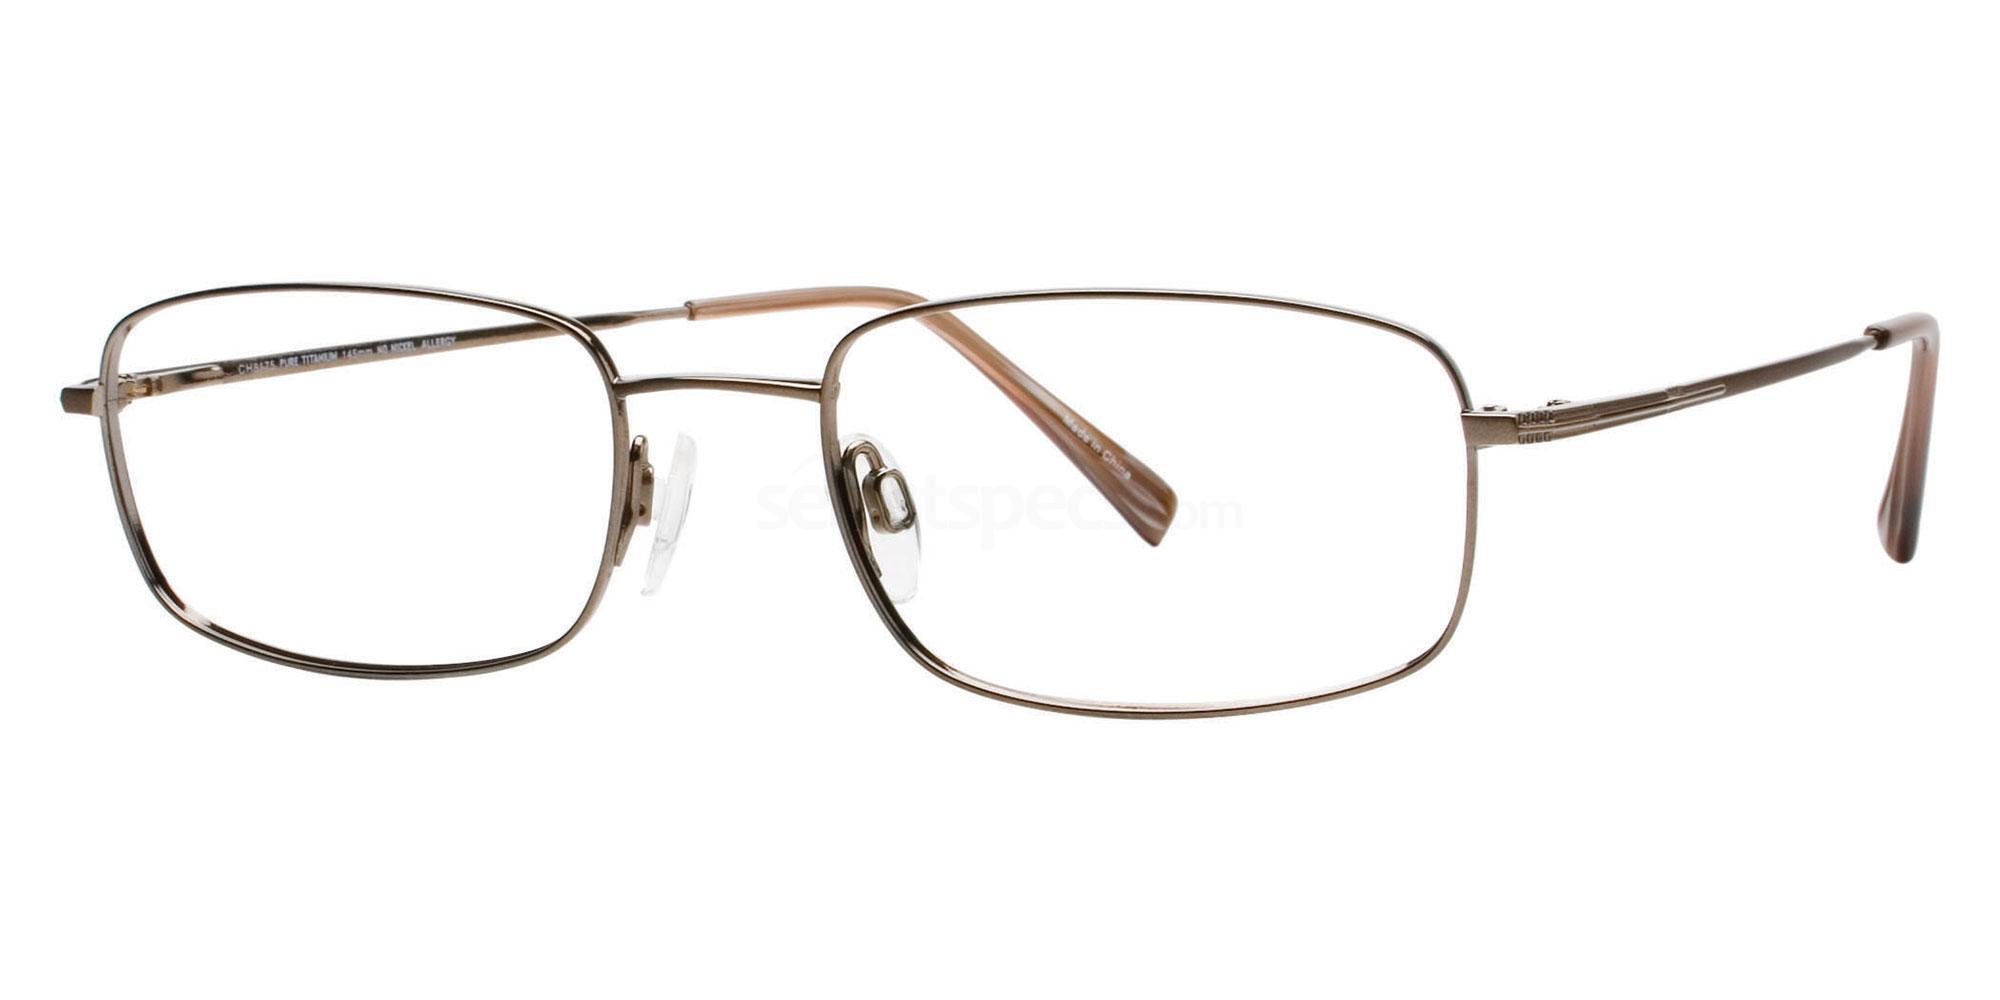 BR CH8175 Glasses, Charmant Titanium Perfection